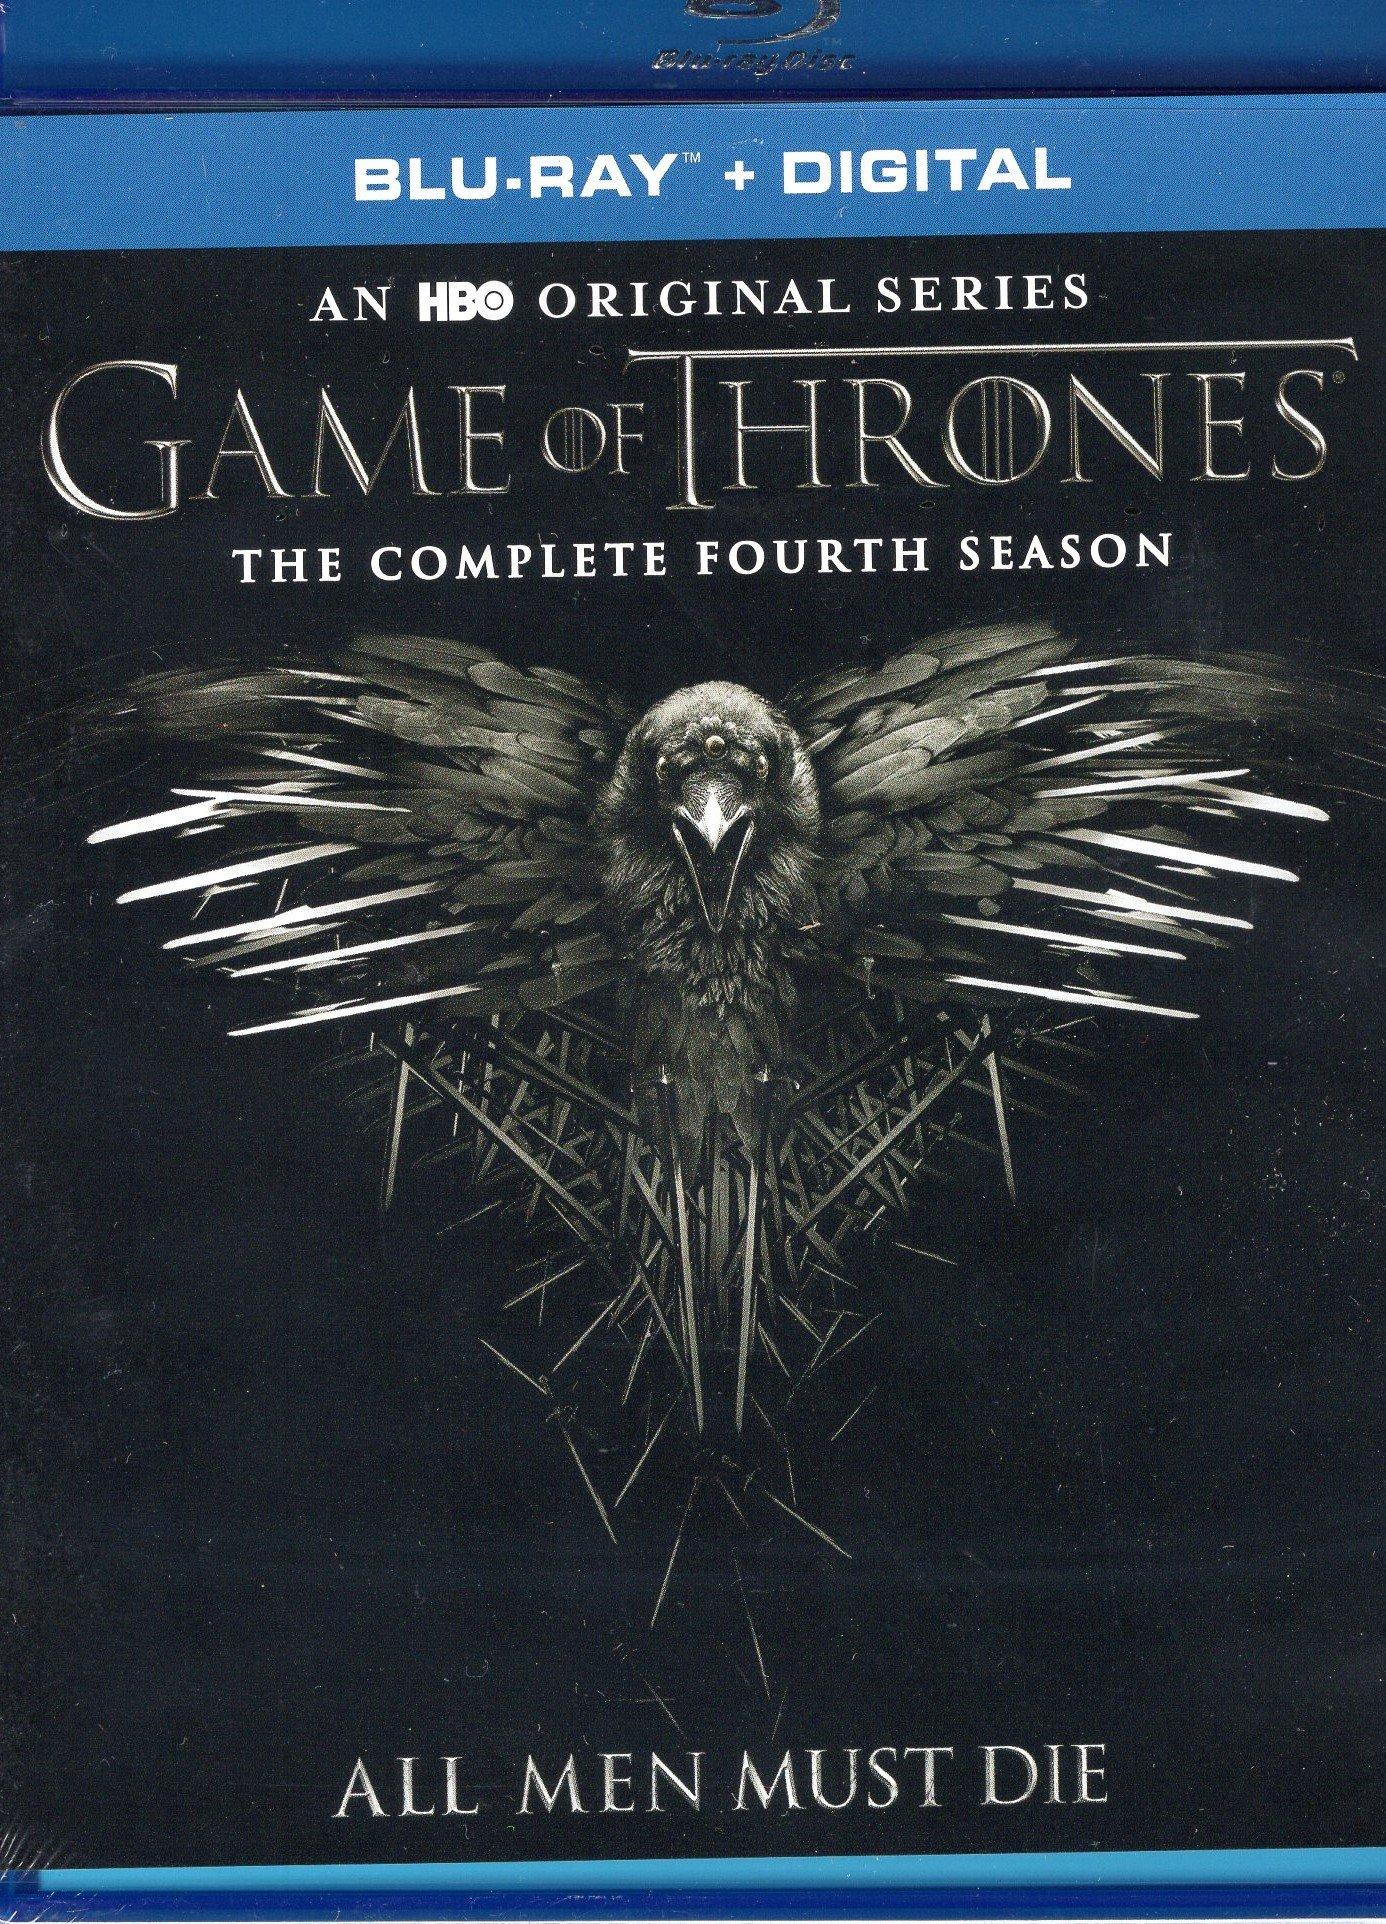 Blu-ray : Game Of Thrones: Season 4 (Boxed Set, Ultraviolet Digital Copy, Full Frame, Digital Copy, Subtitled)